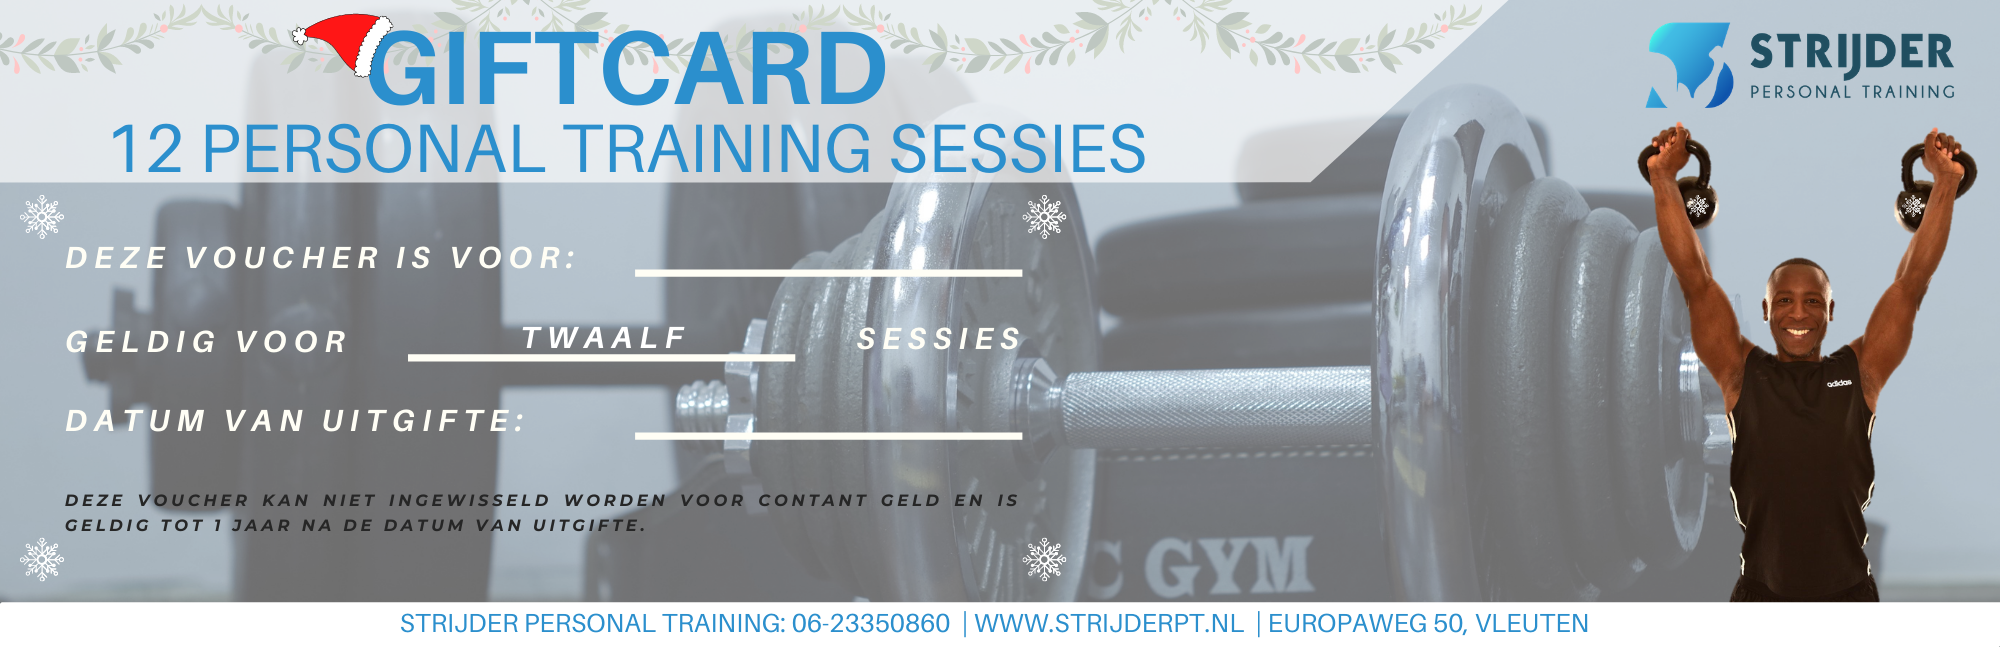 Strijder Personal Training Kerst Giftcard voor 12 sessies